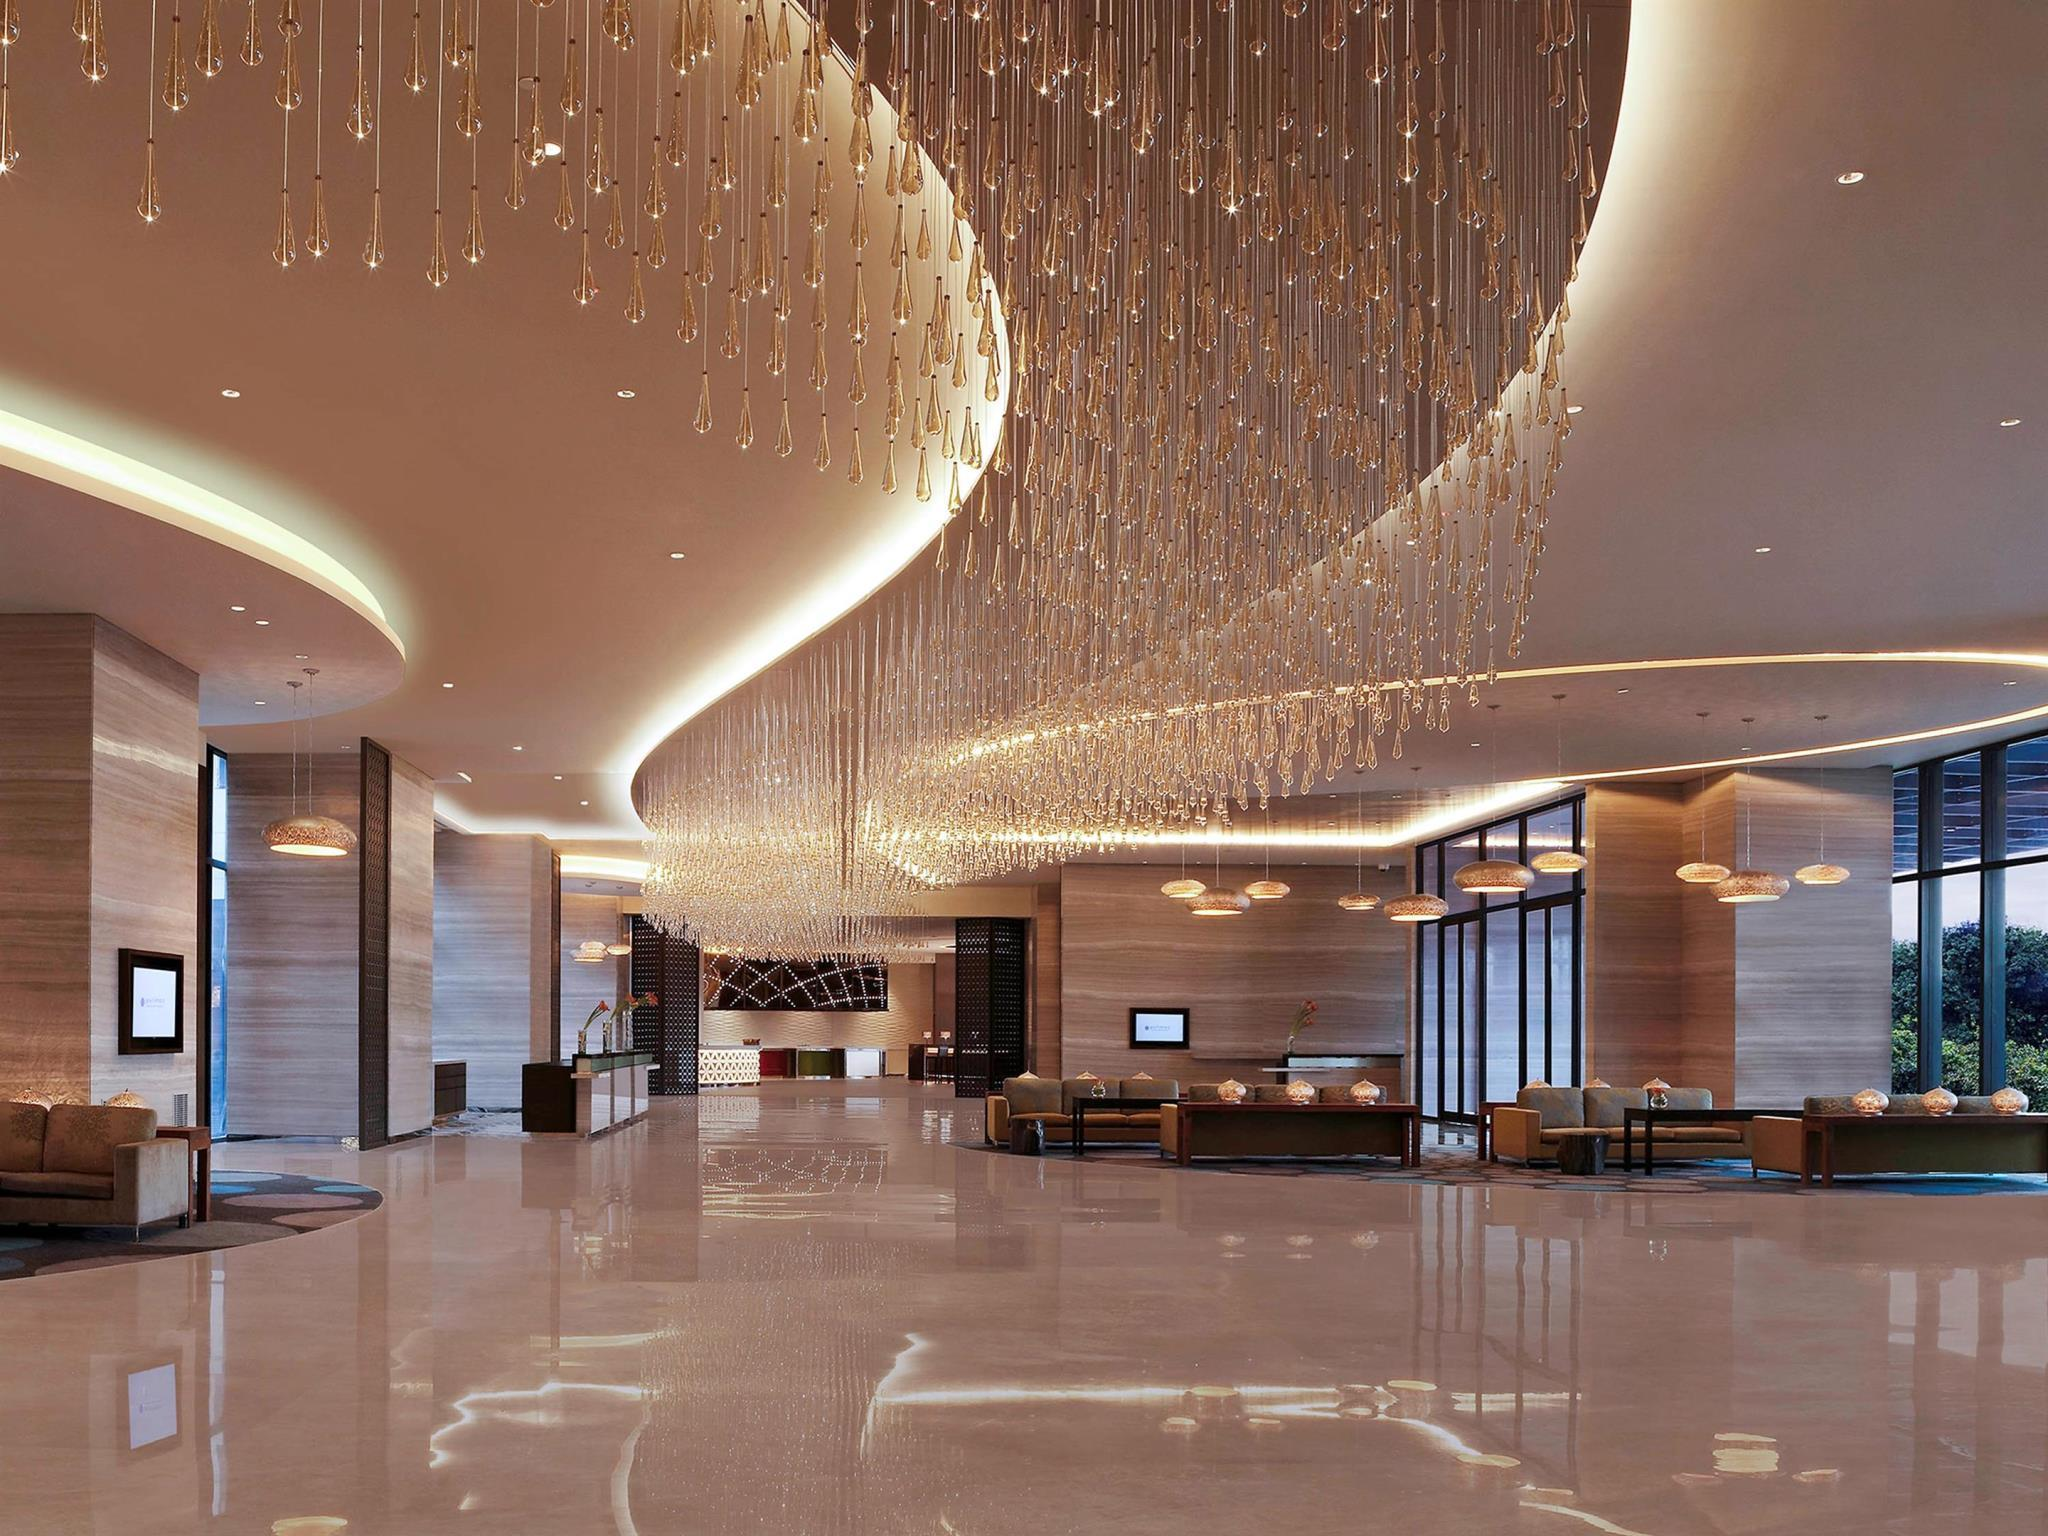 Pullman New Delhi Aerocity Hotel - An AccorHotels Brand, West